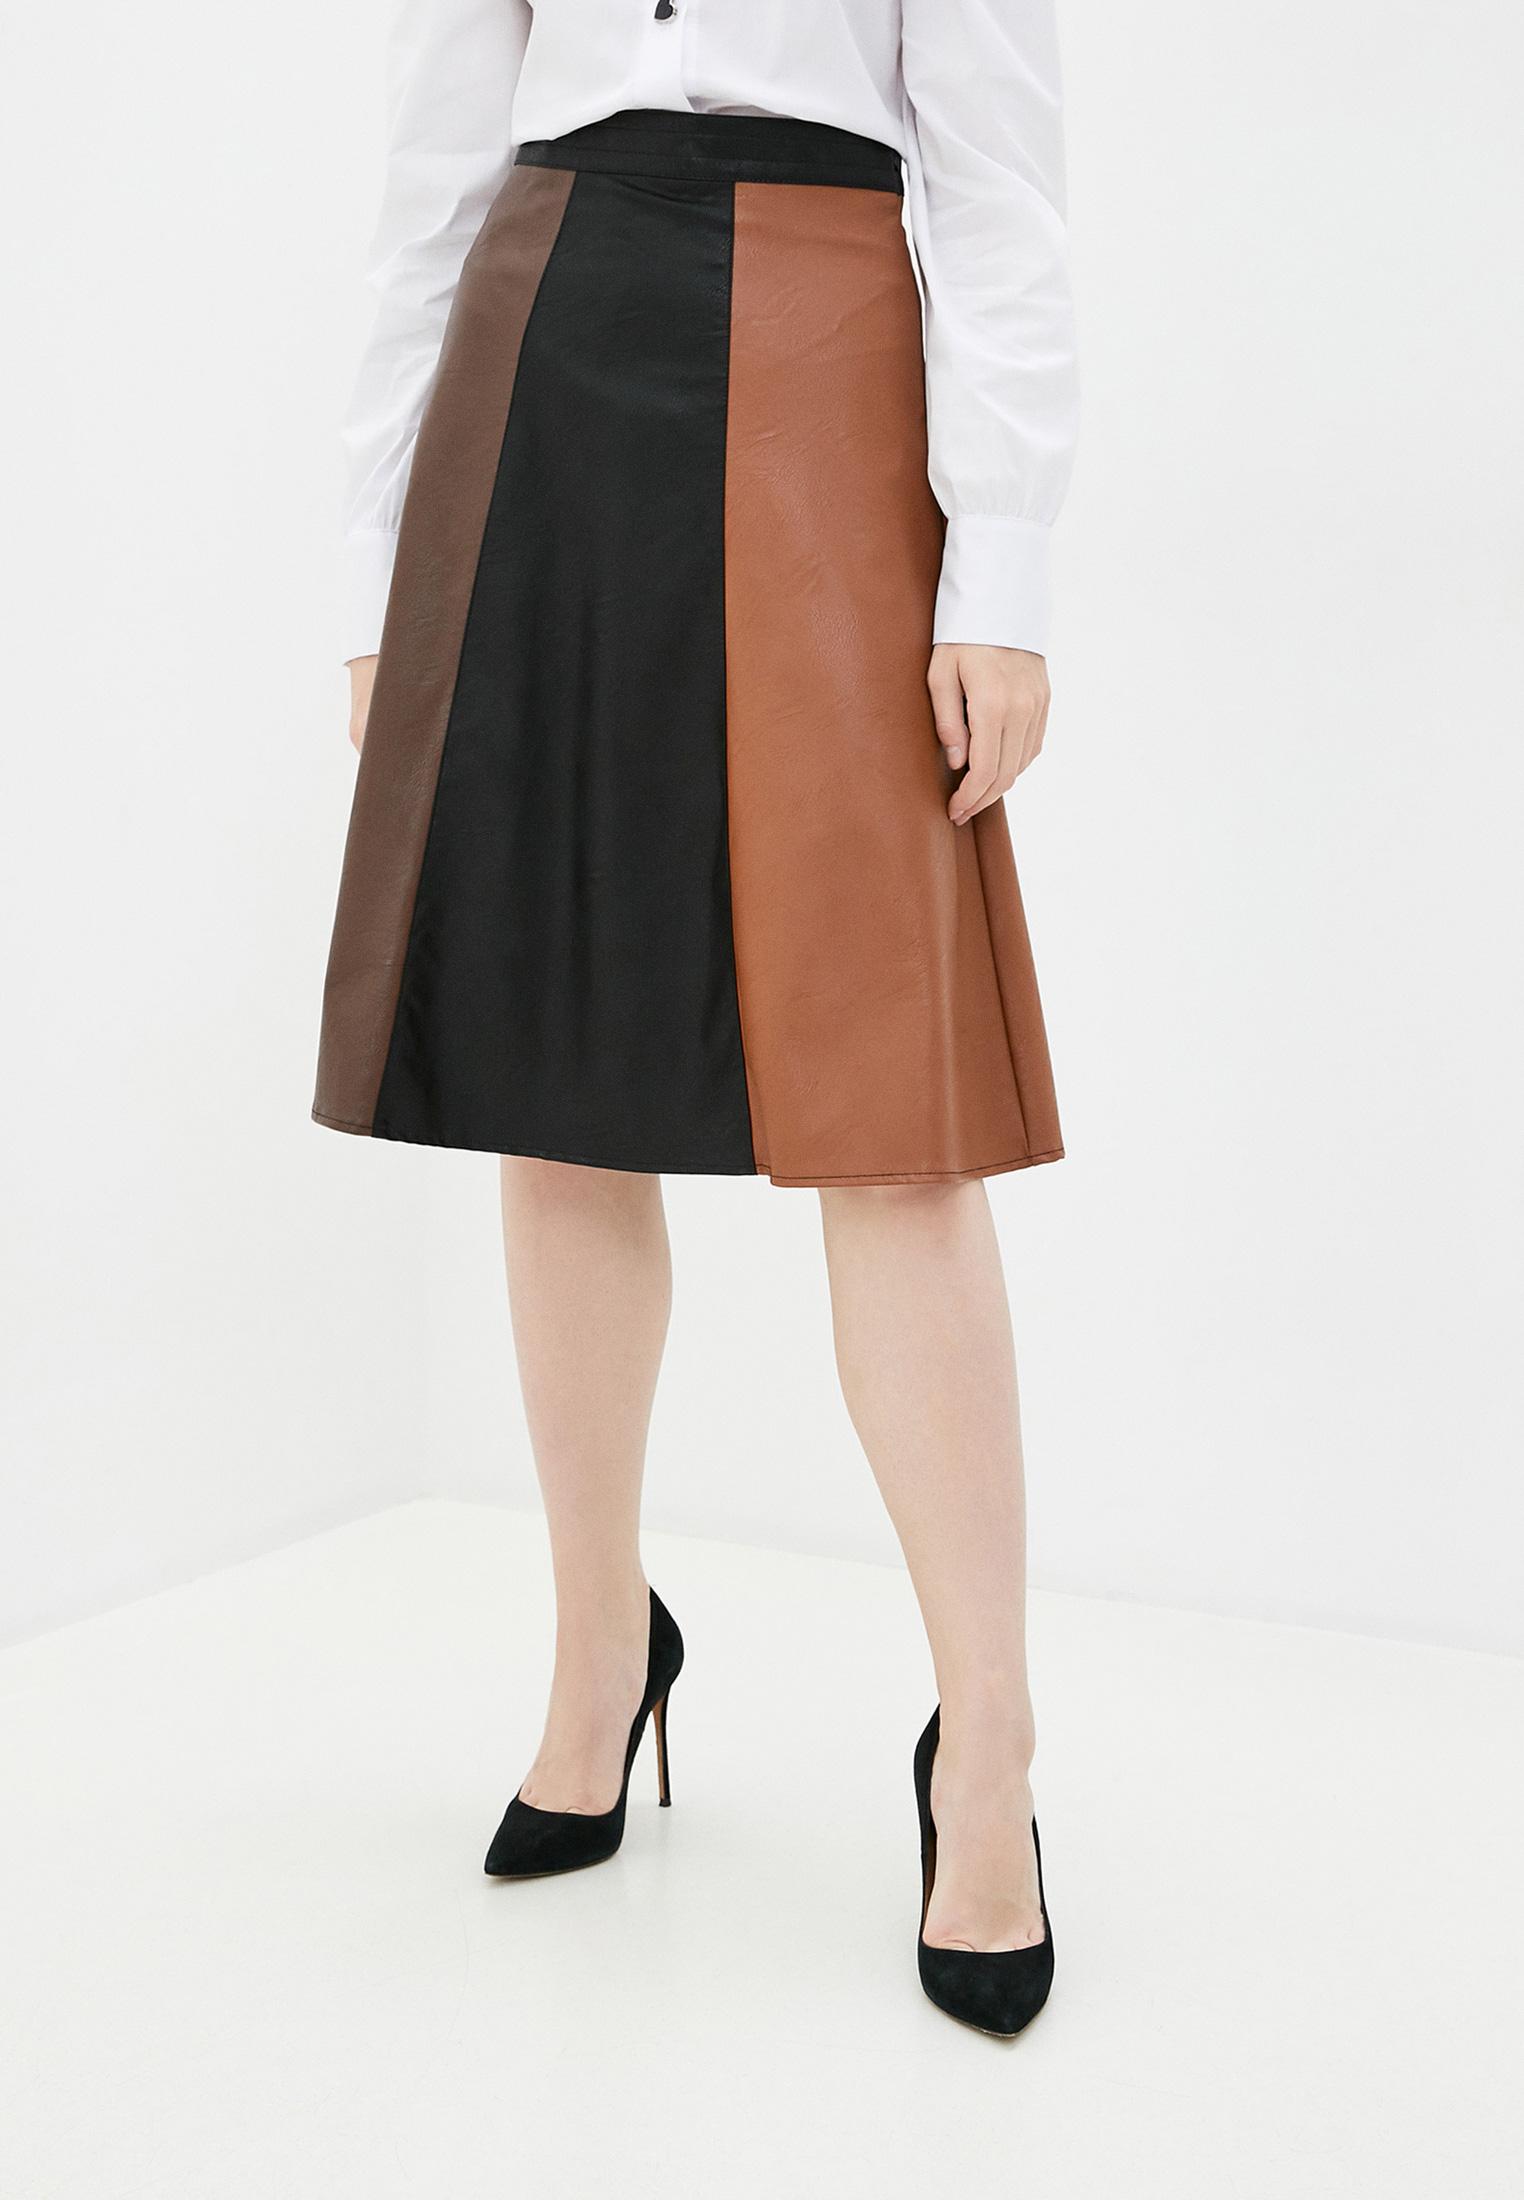 Широкая юбка Rinascimento (Ринасименто) Юбка Rinascimento